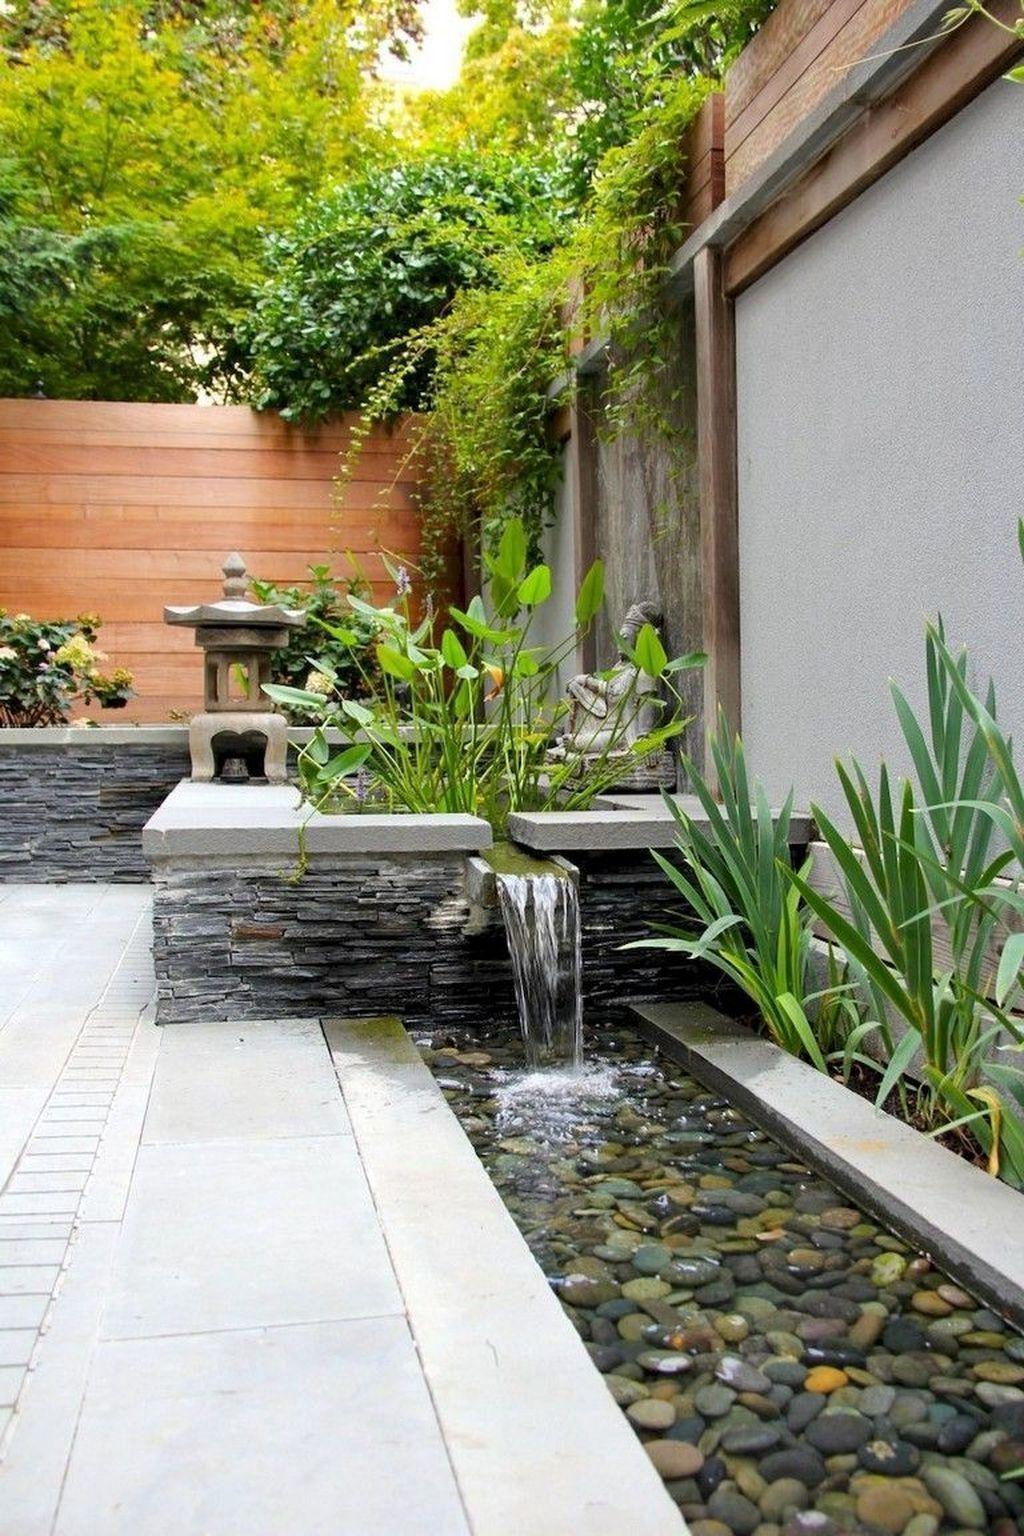 40 Awesome Backyard Landscaping Ideas With Elegant Accent ... dedans Jardin Zen Avec Fontaine